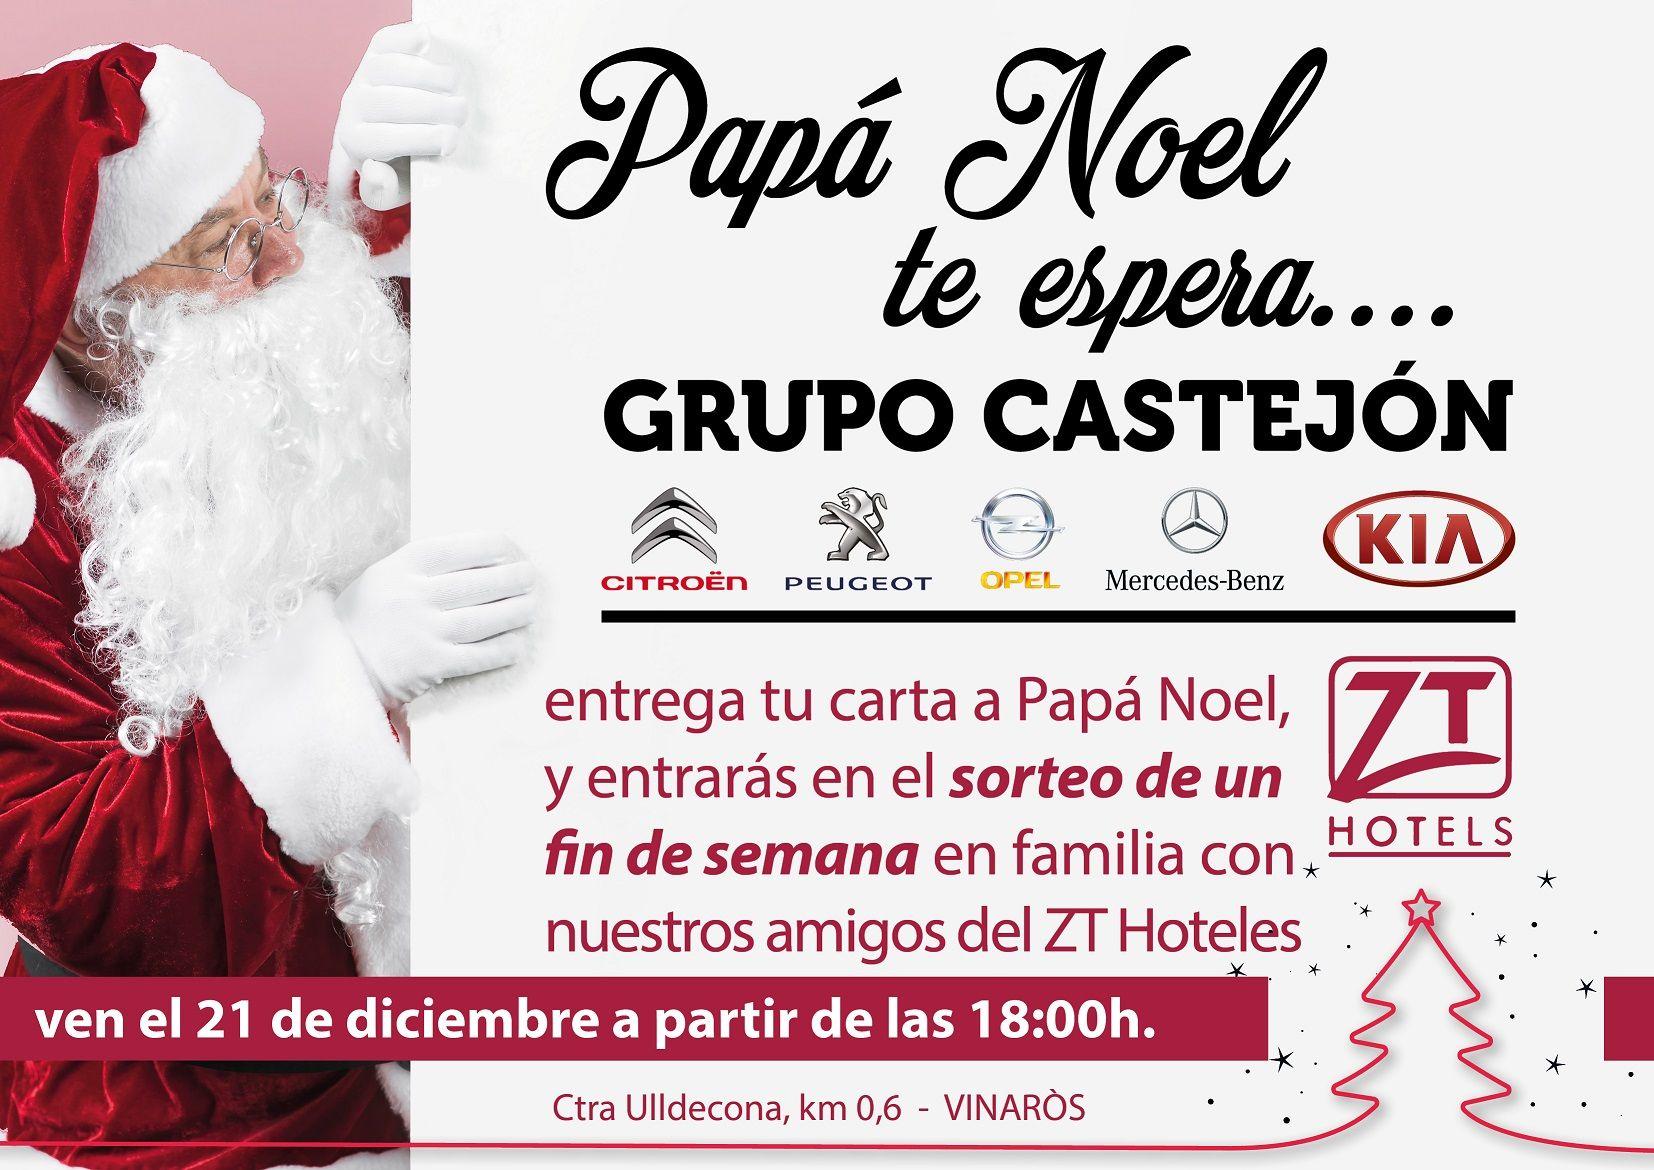 Papá Noel te espera en Grupo Castejón